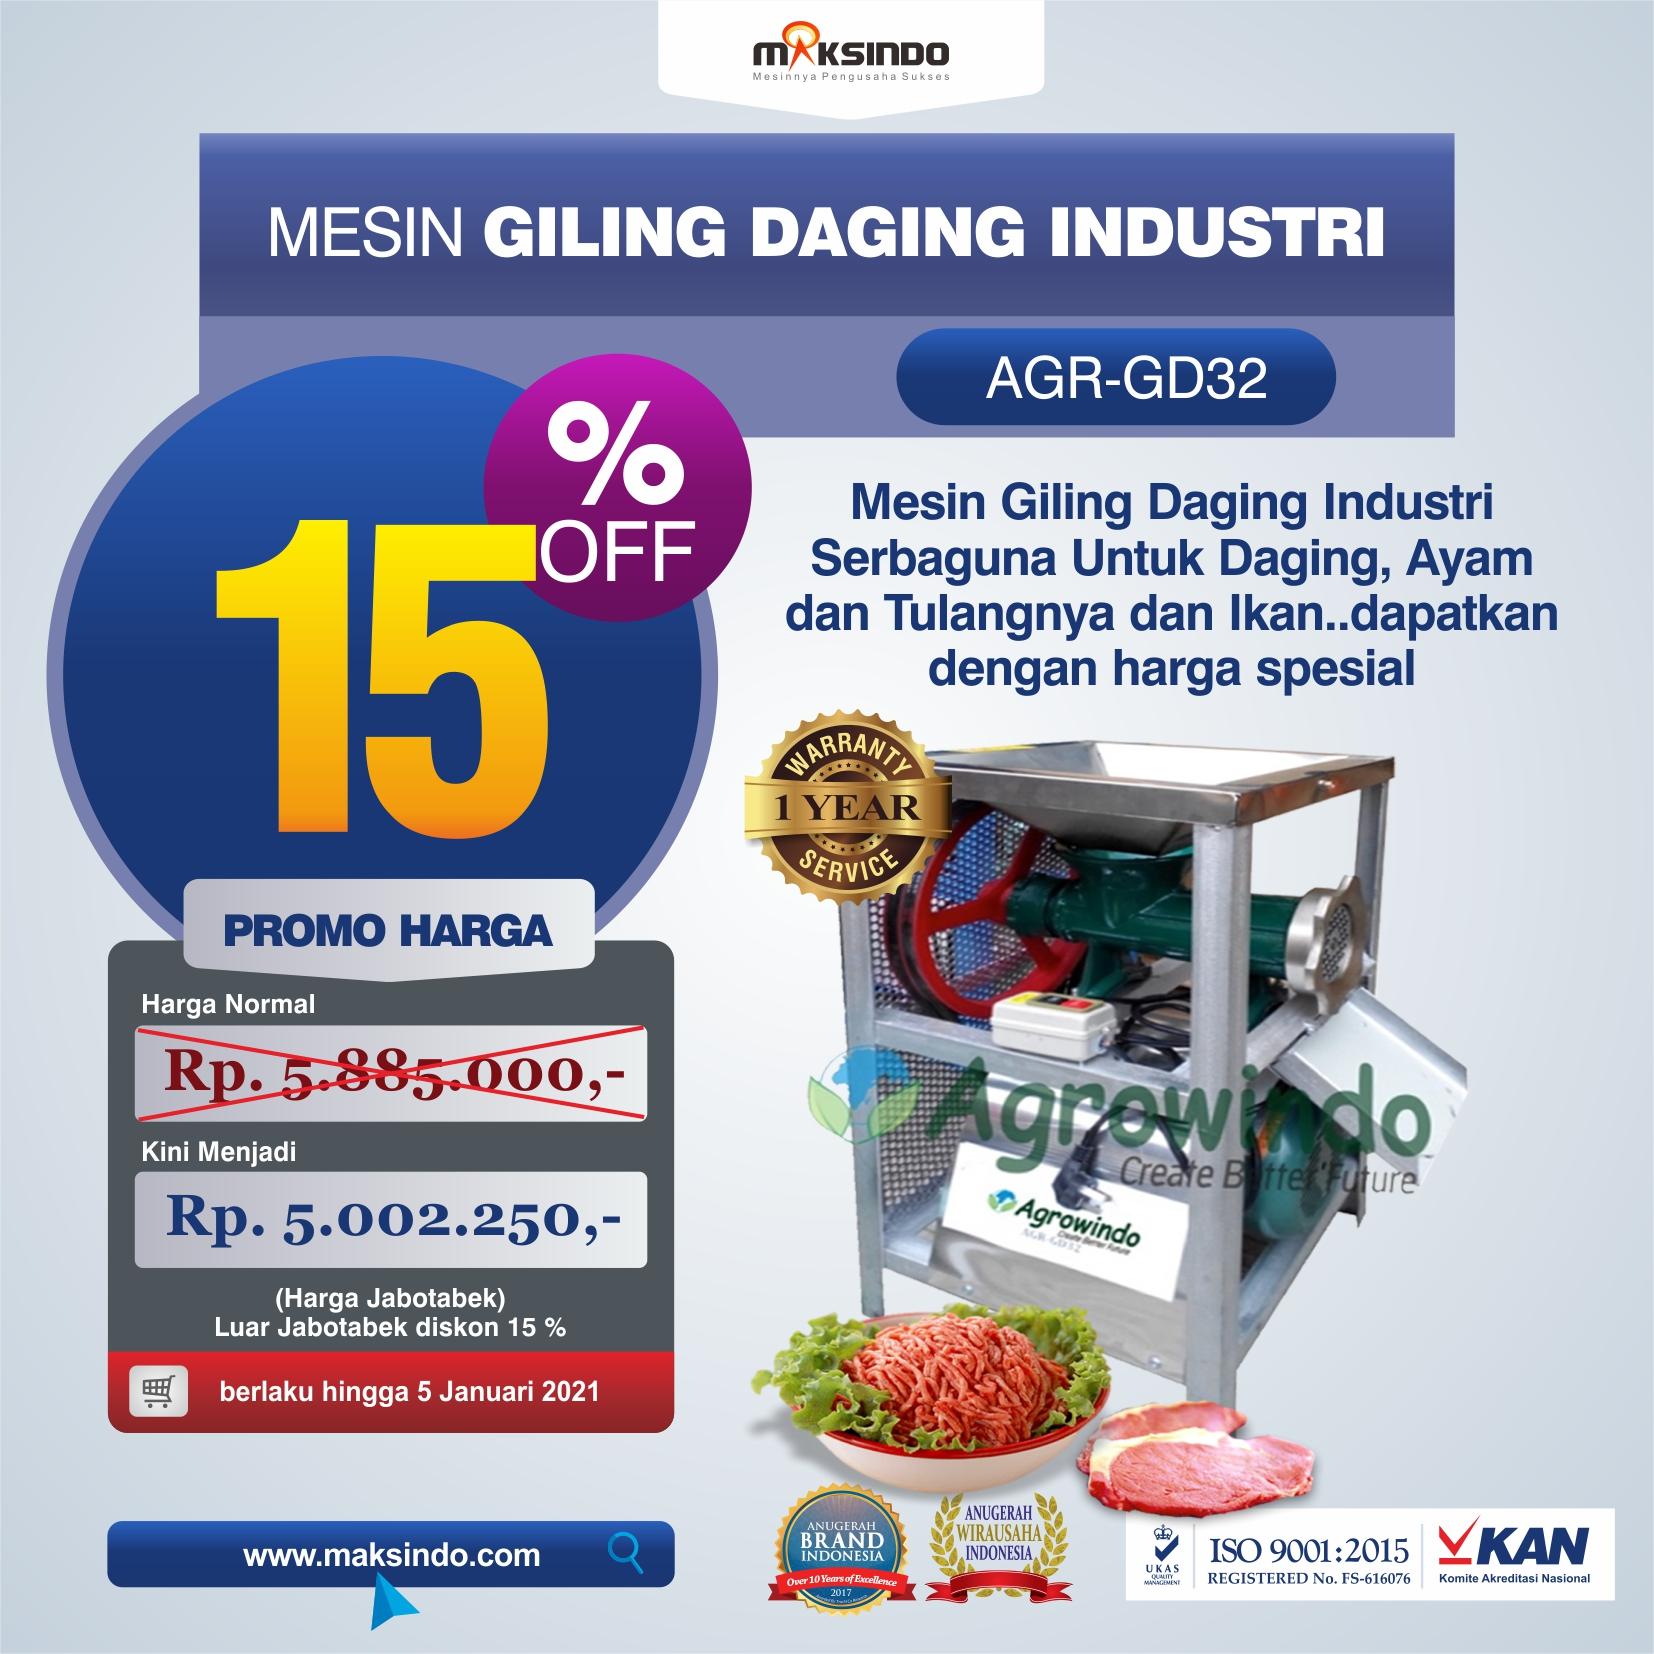 Jual Mesin Giling Daging Industri (AGR-GD32) di Yogyakarta